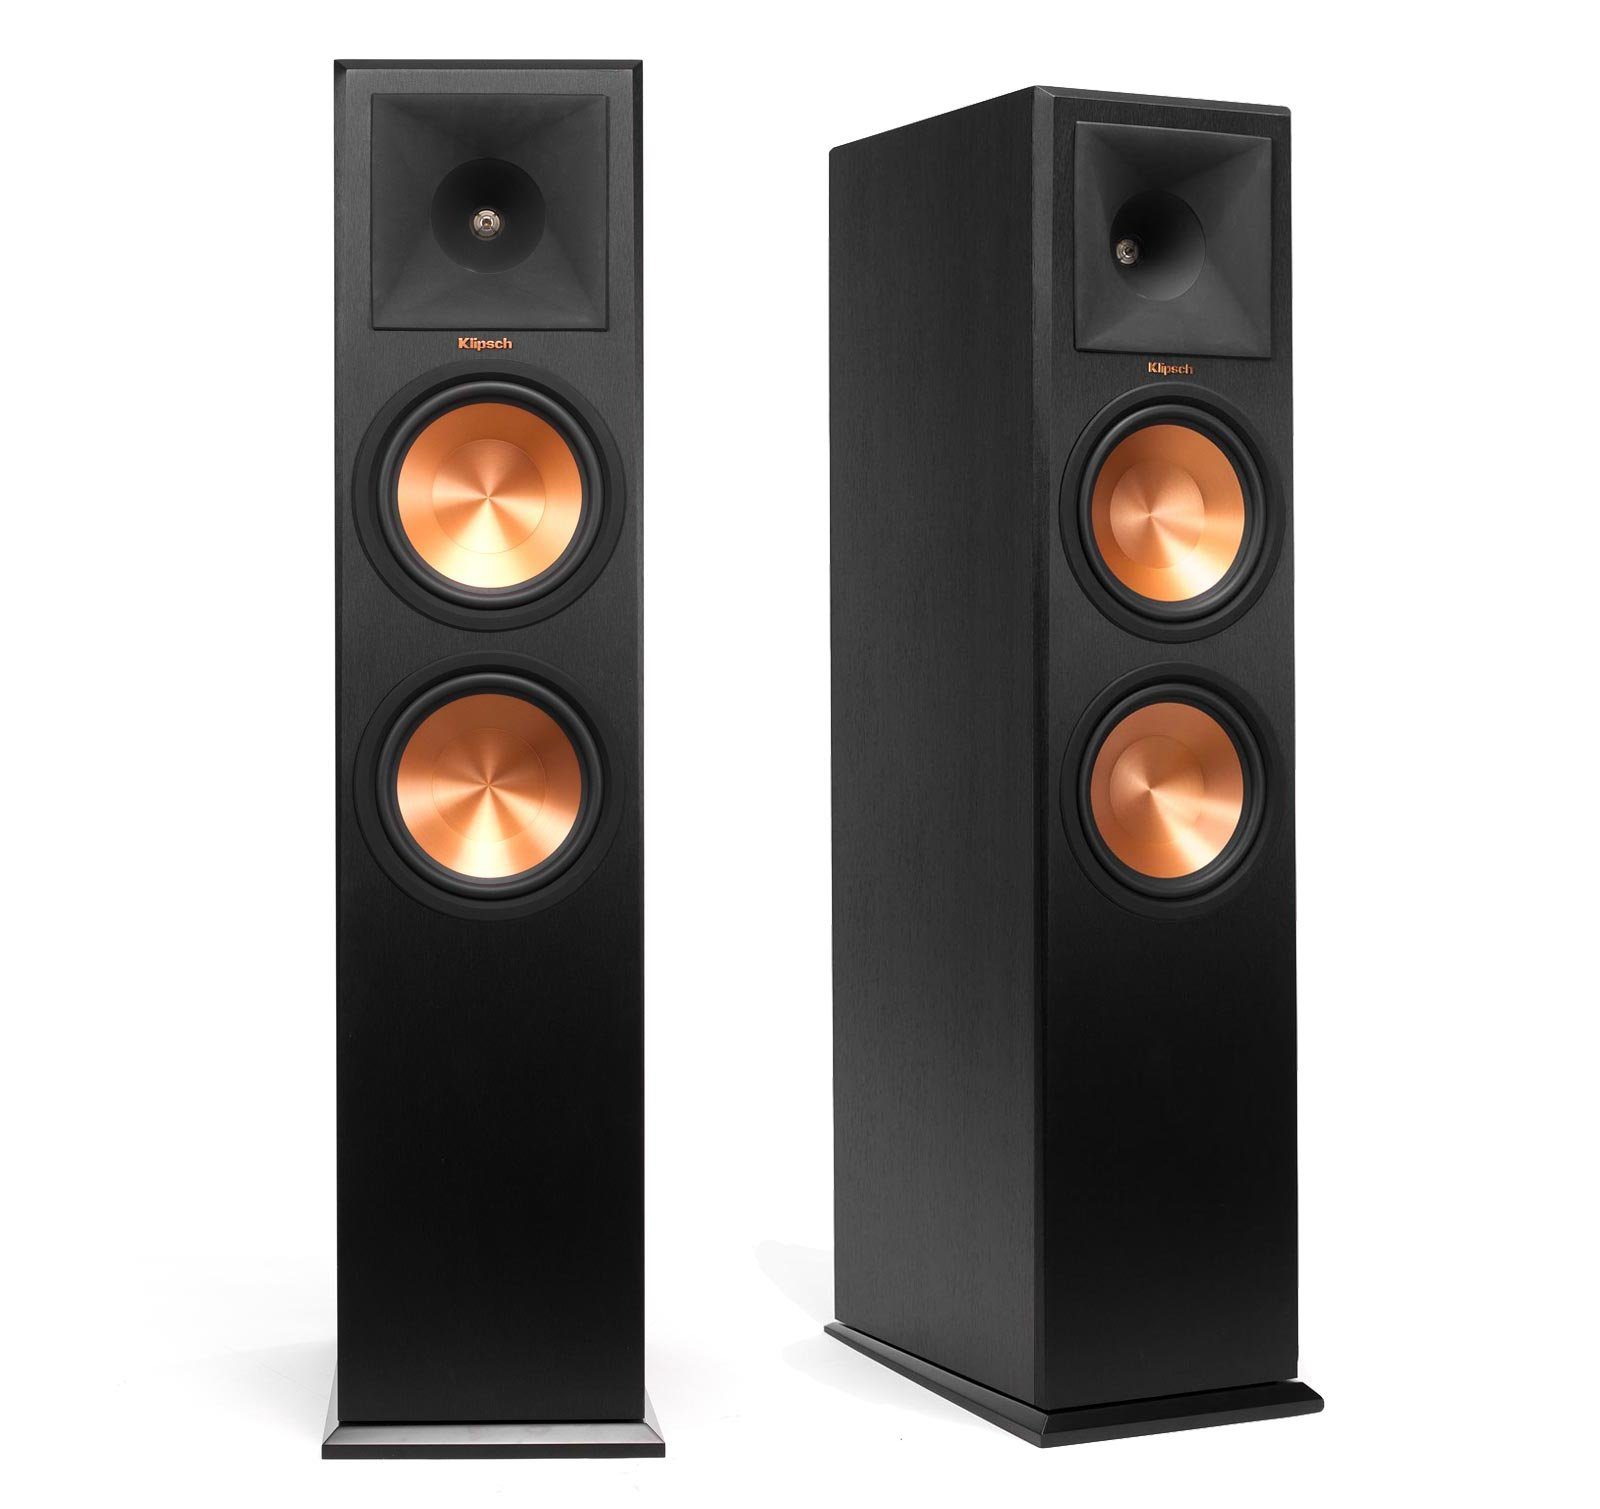 Klipsch RP 280F Reference Premiere Floorstanding Speaker With Dual 8 Inch Cerametallic Cone Woofers